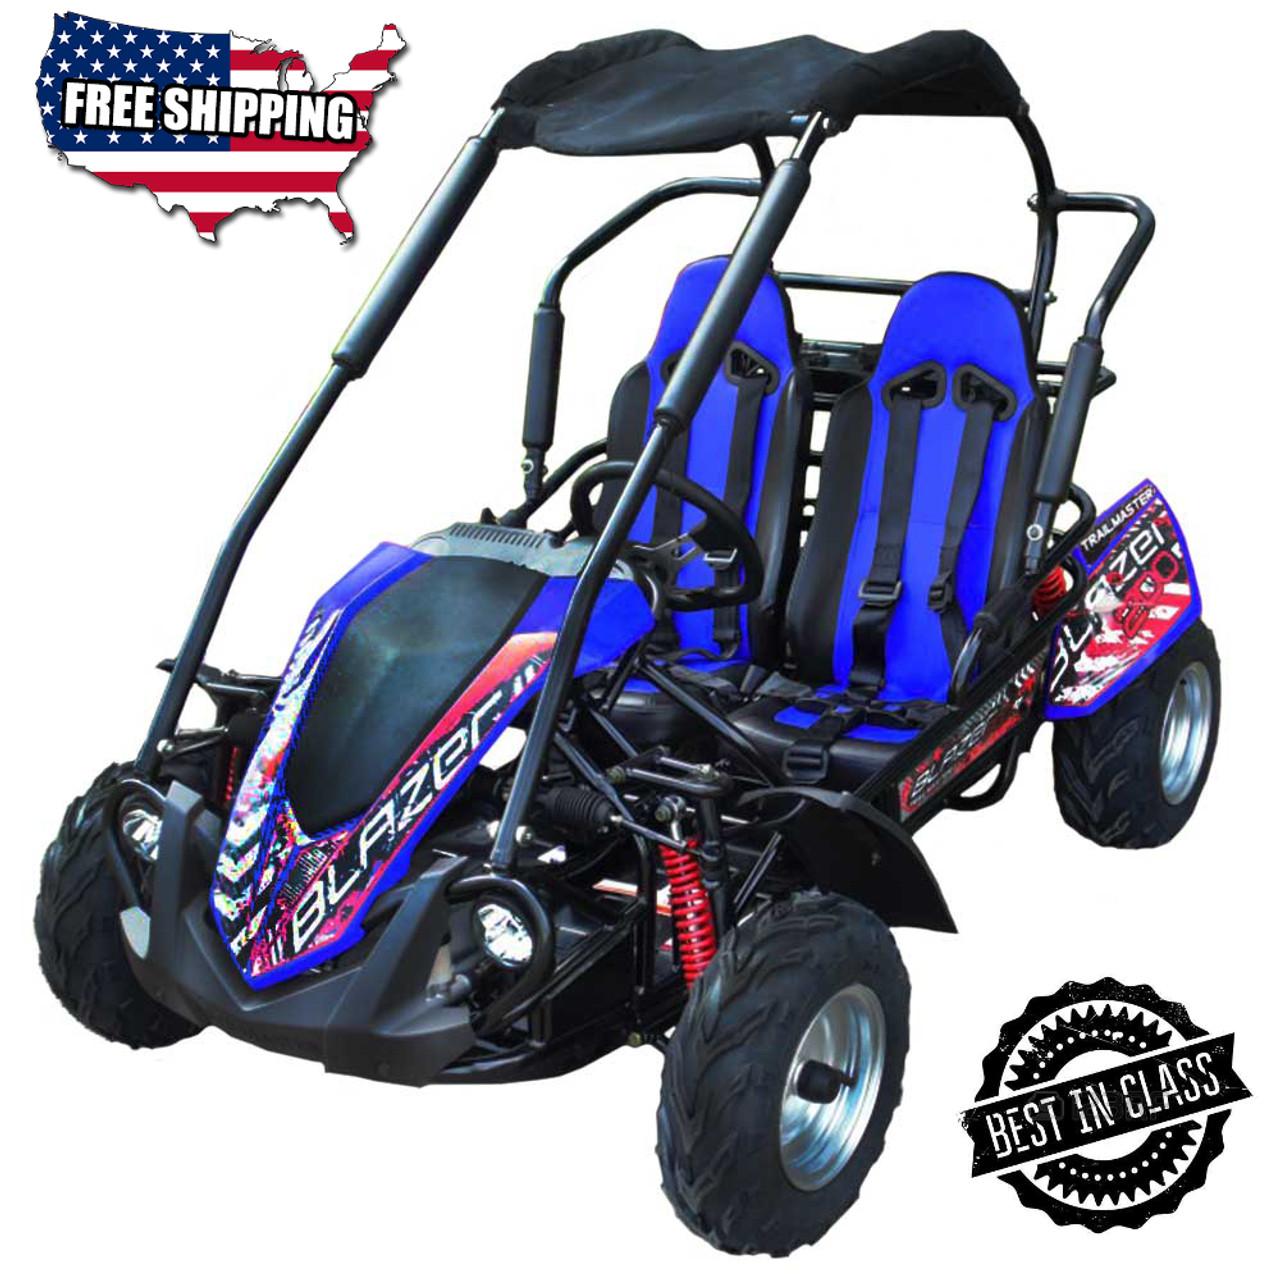 TrailMaster Blazer 200R Go Kart w/ Reverse - Ships FREE!!!